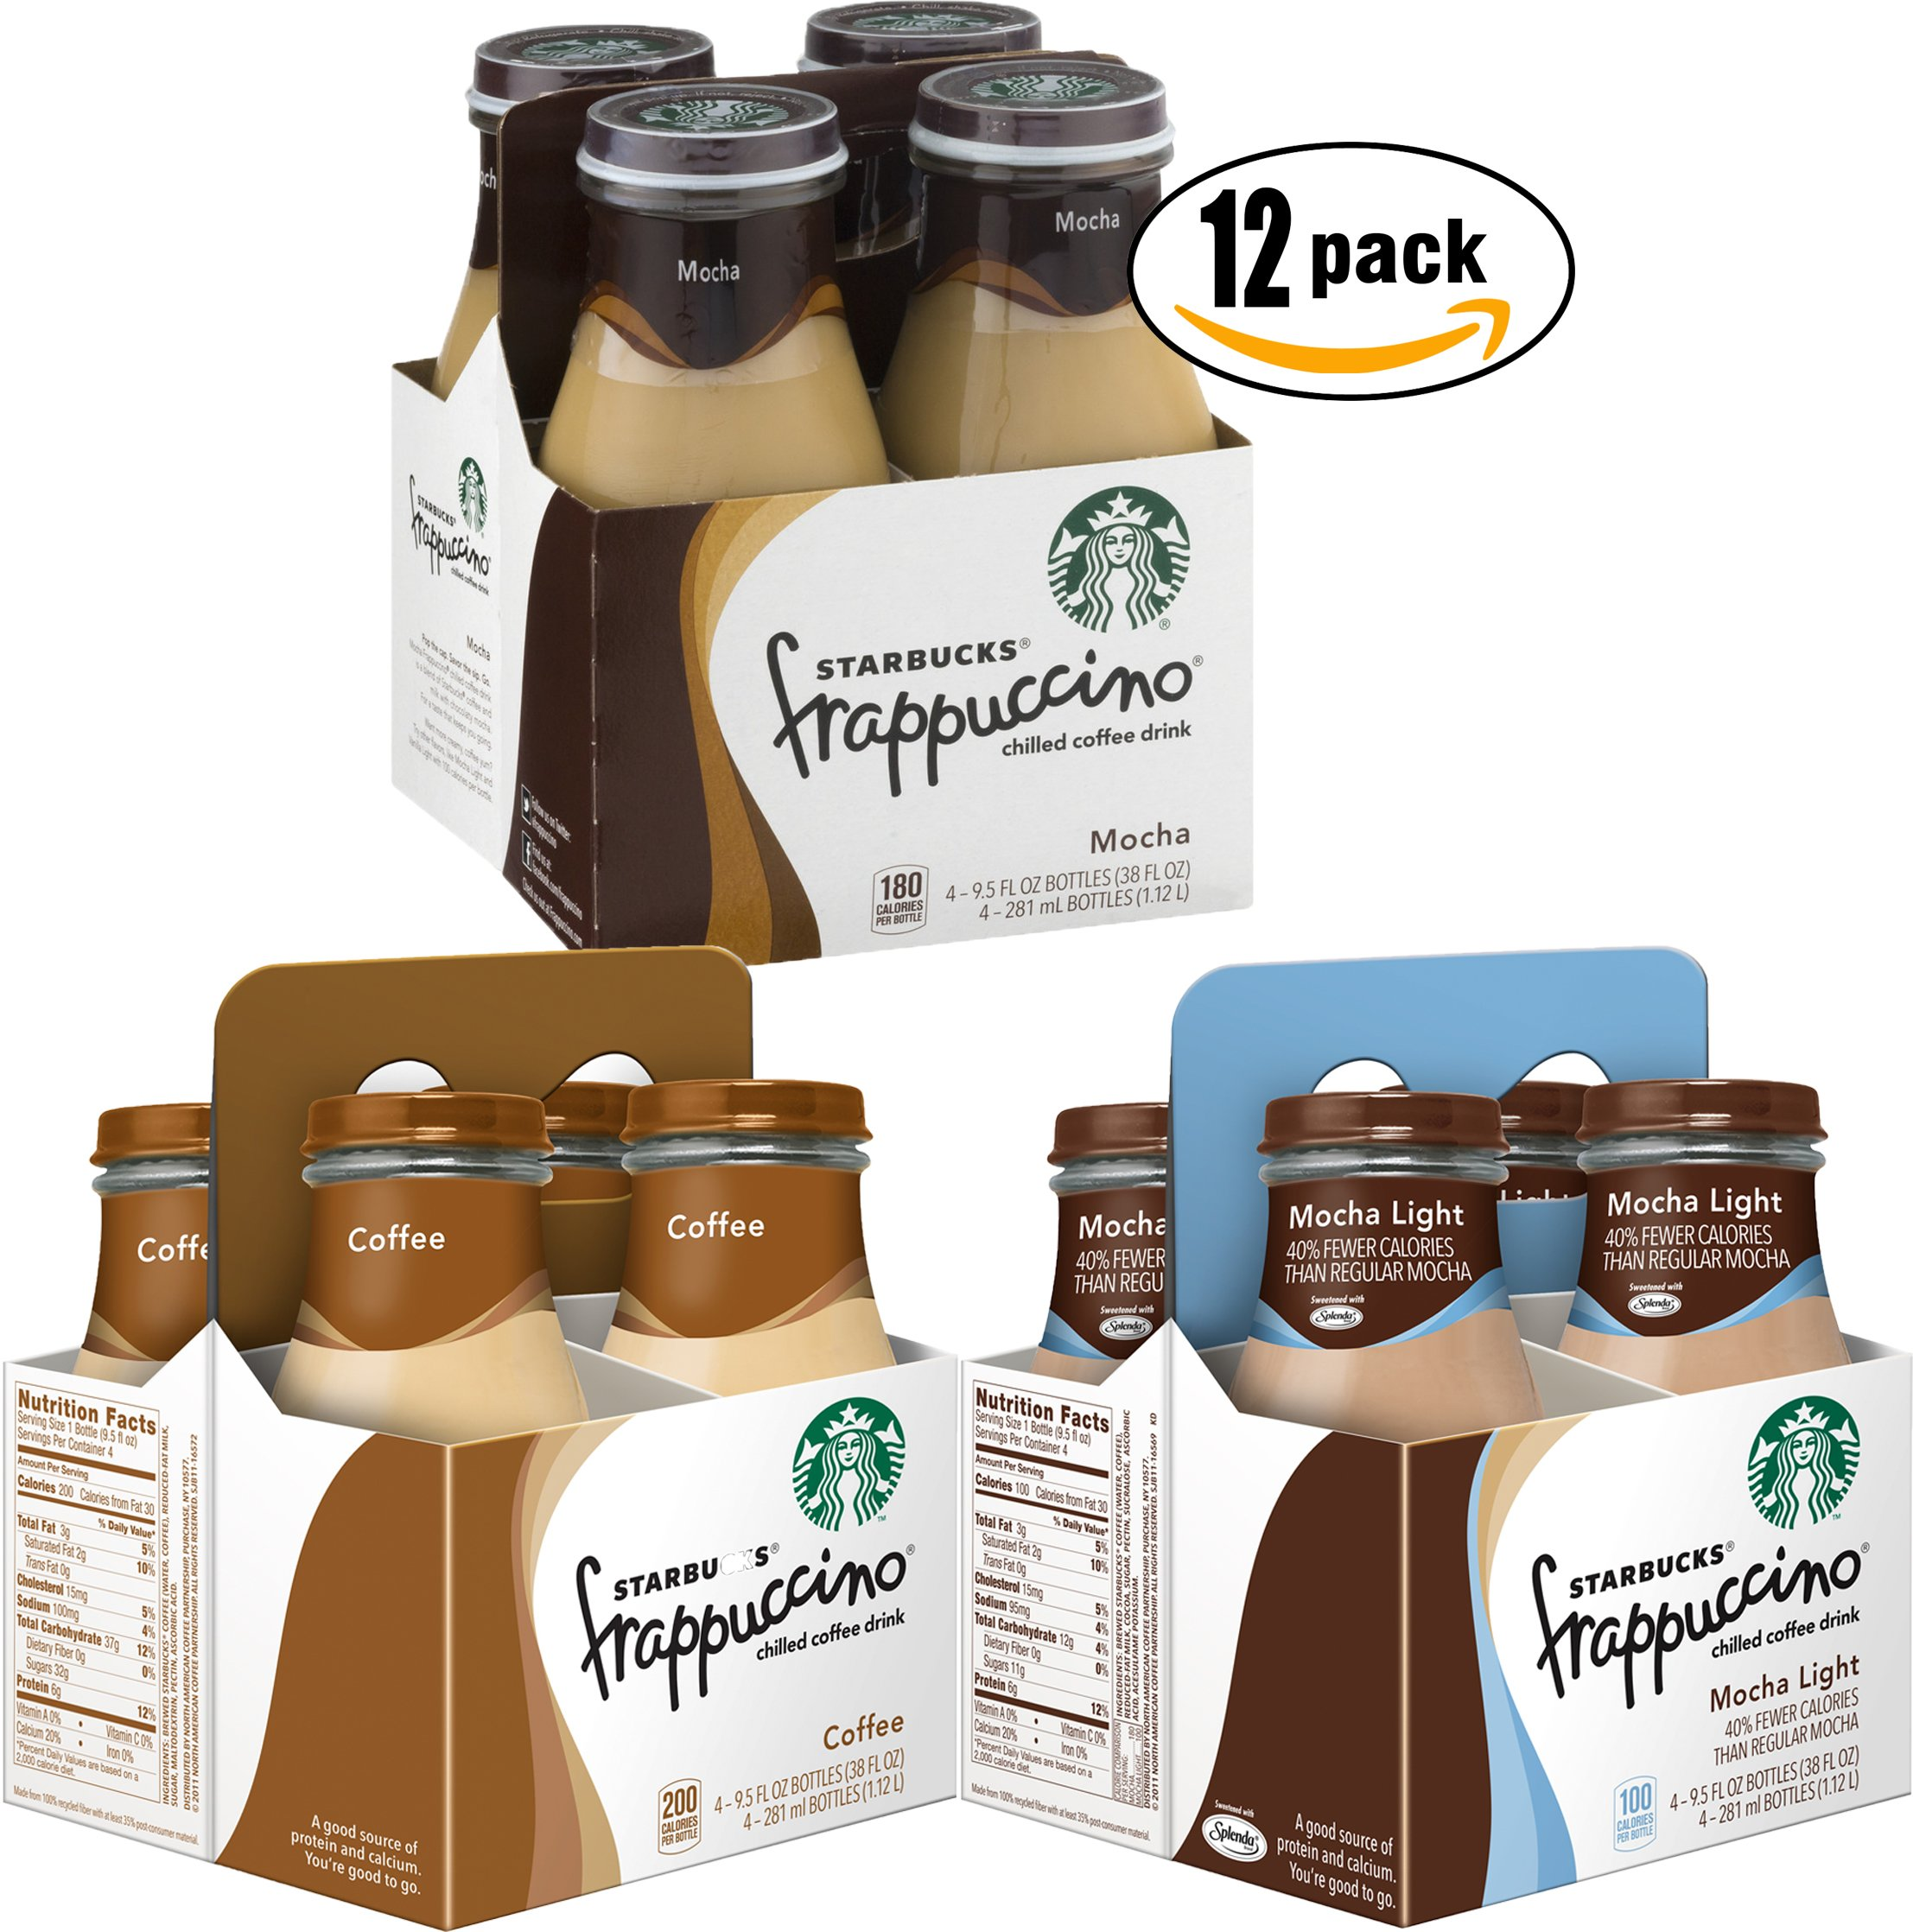 Starbucks Coffee Frappuccino Variety Pack! Mocha Light, Coffee, Chilled Mocha, 9.5 oz Glass Bottles (Pack of 3, Total of 12 Glass Bottles) by Starbucks Coffee Frappuccino (Image #1)